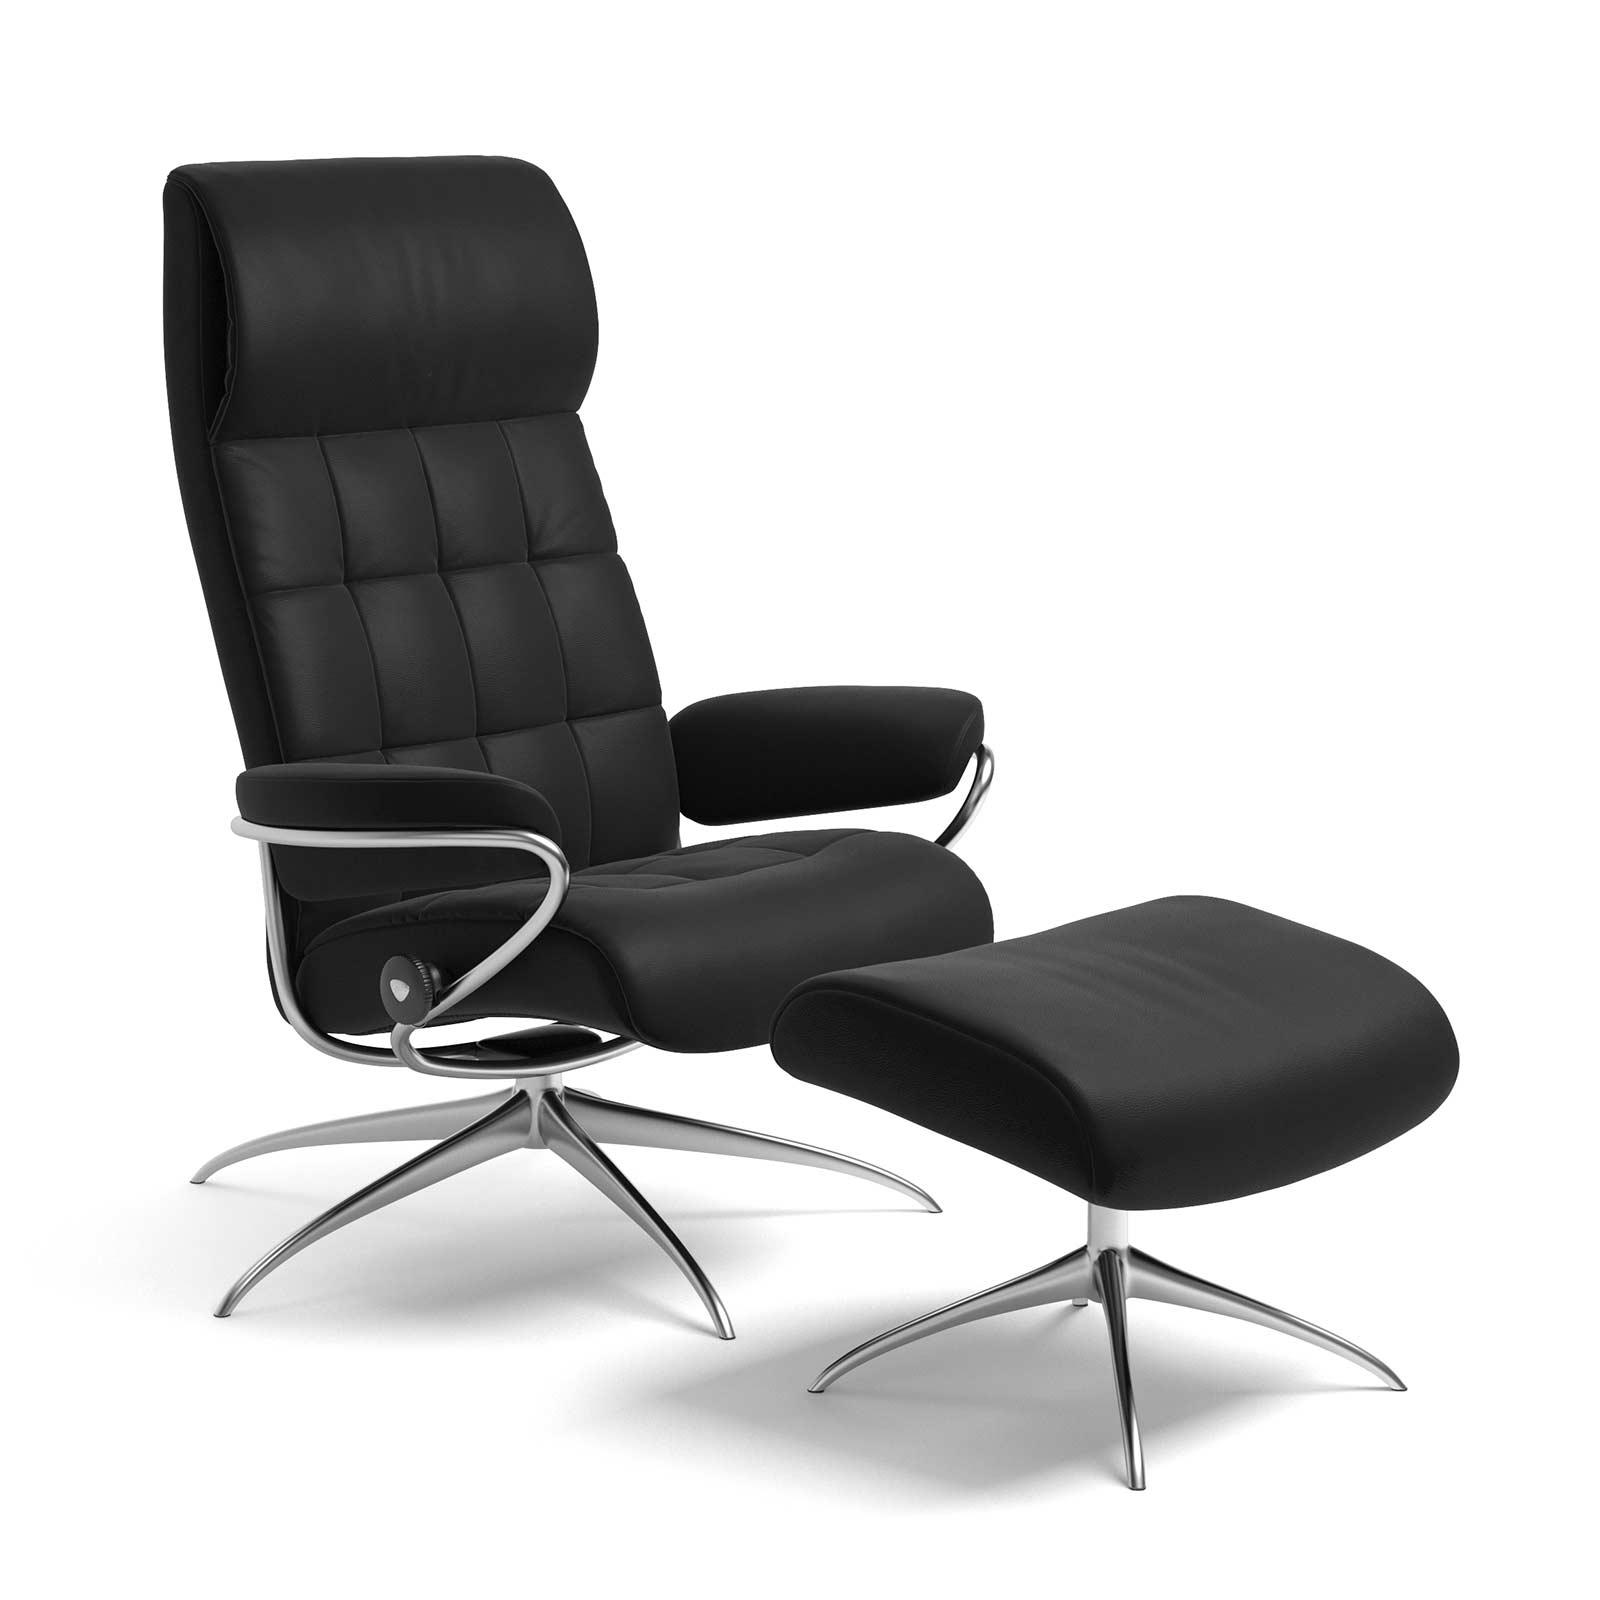 stressless london sessel mit hoher lehne lederfarbe schwarz. Black Bedroom Furniture Sets. Home Design Ideas